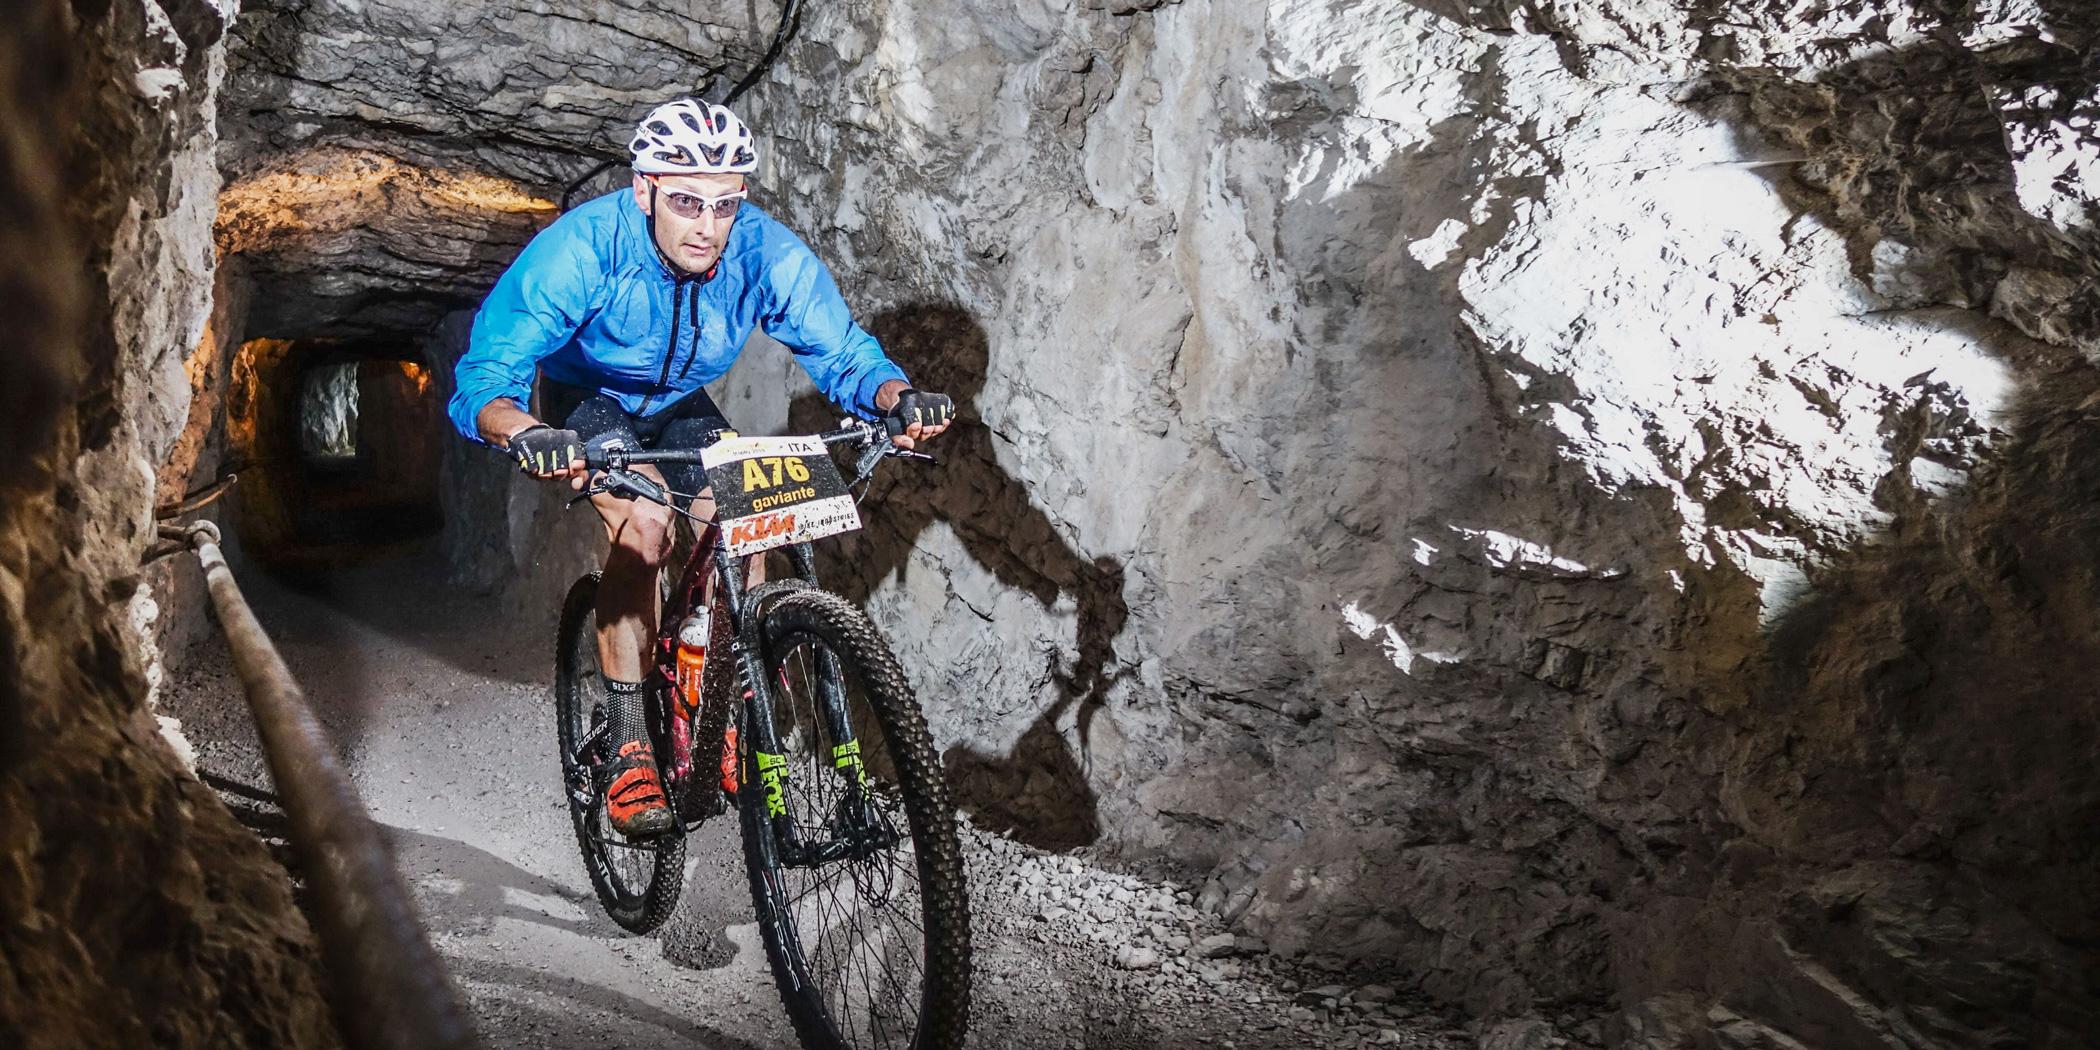 Alessandro Forni (ITA) - 3. Platz Salzkammergut Trophy 2019 - M30 Strecke A (Foto: sportograf.de)